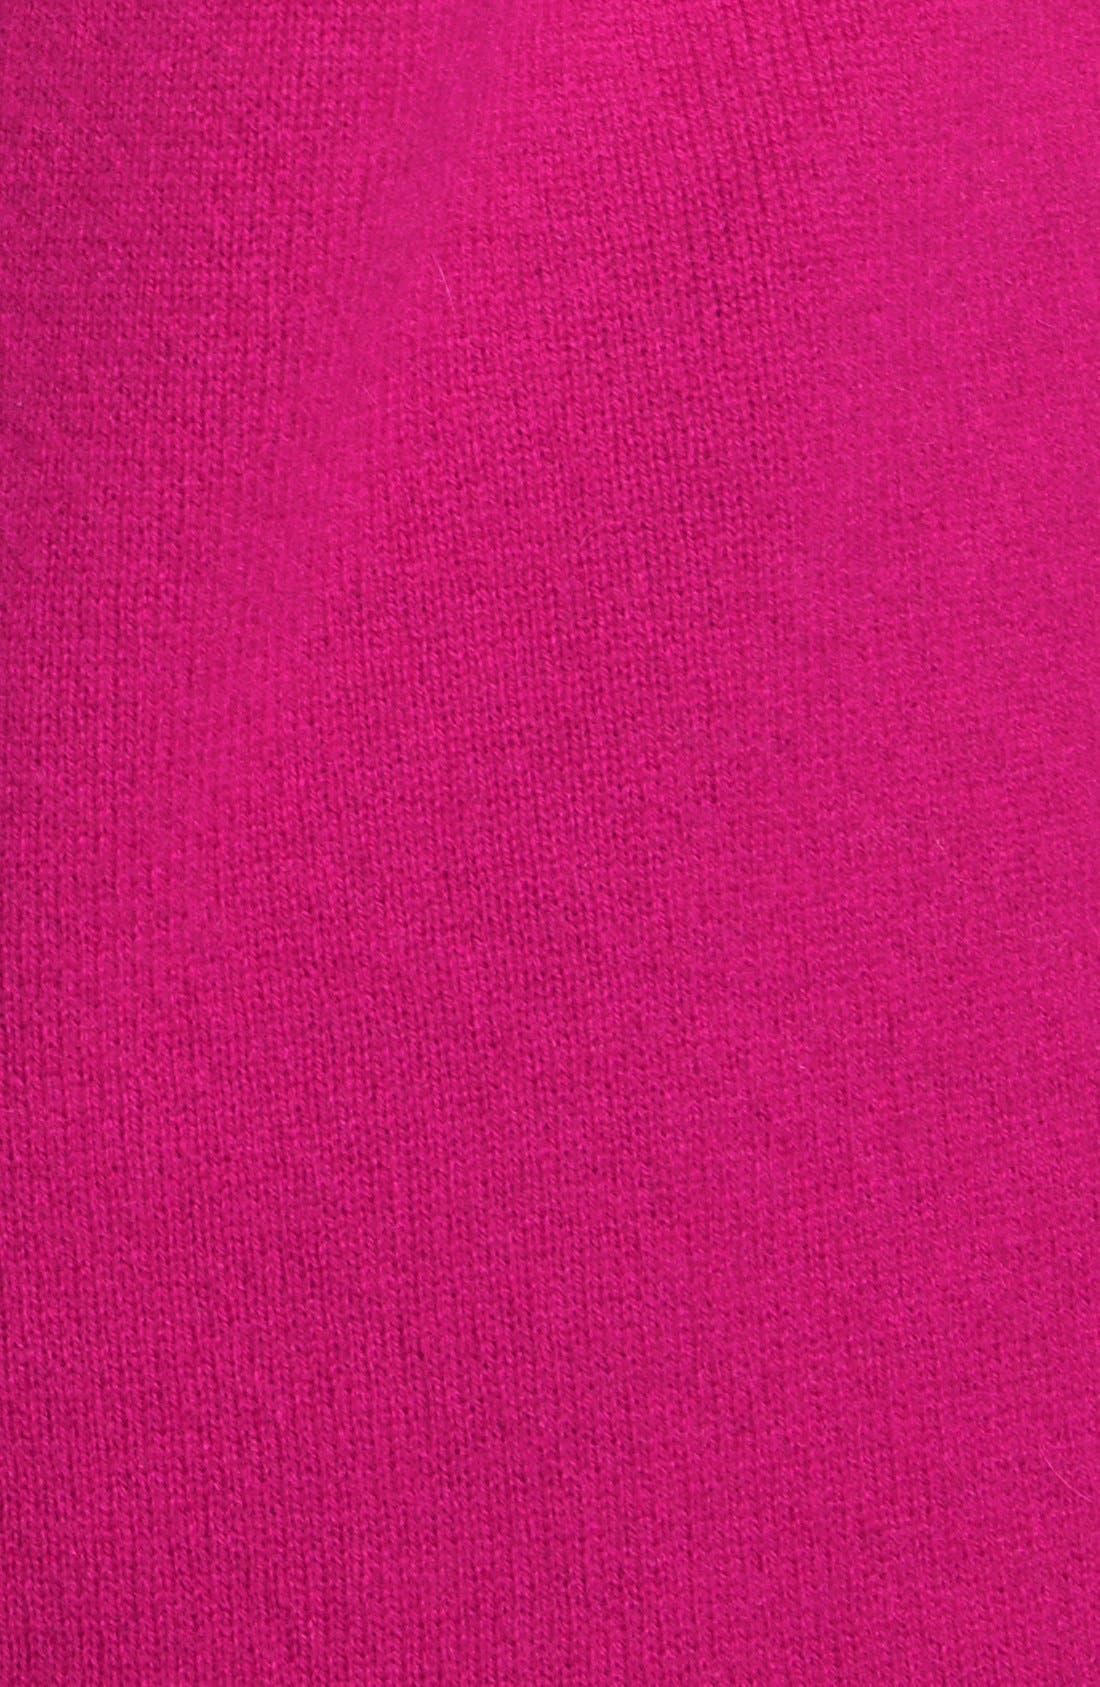 Alternate Image 2  - Halogen® Shirttail Wool & Cashmere Boatneck Tunic (Regular & Petite)